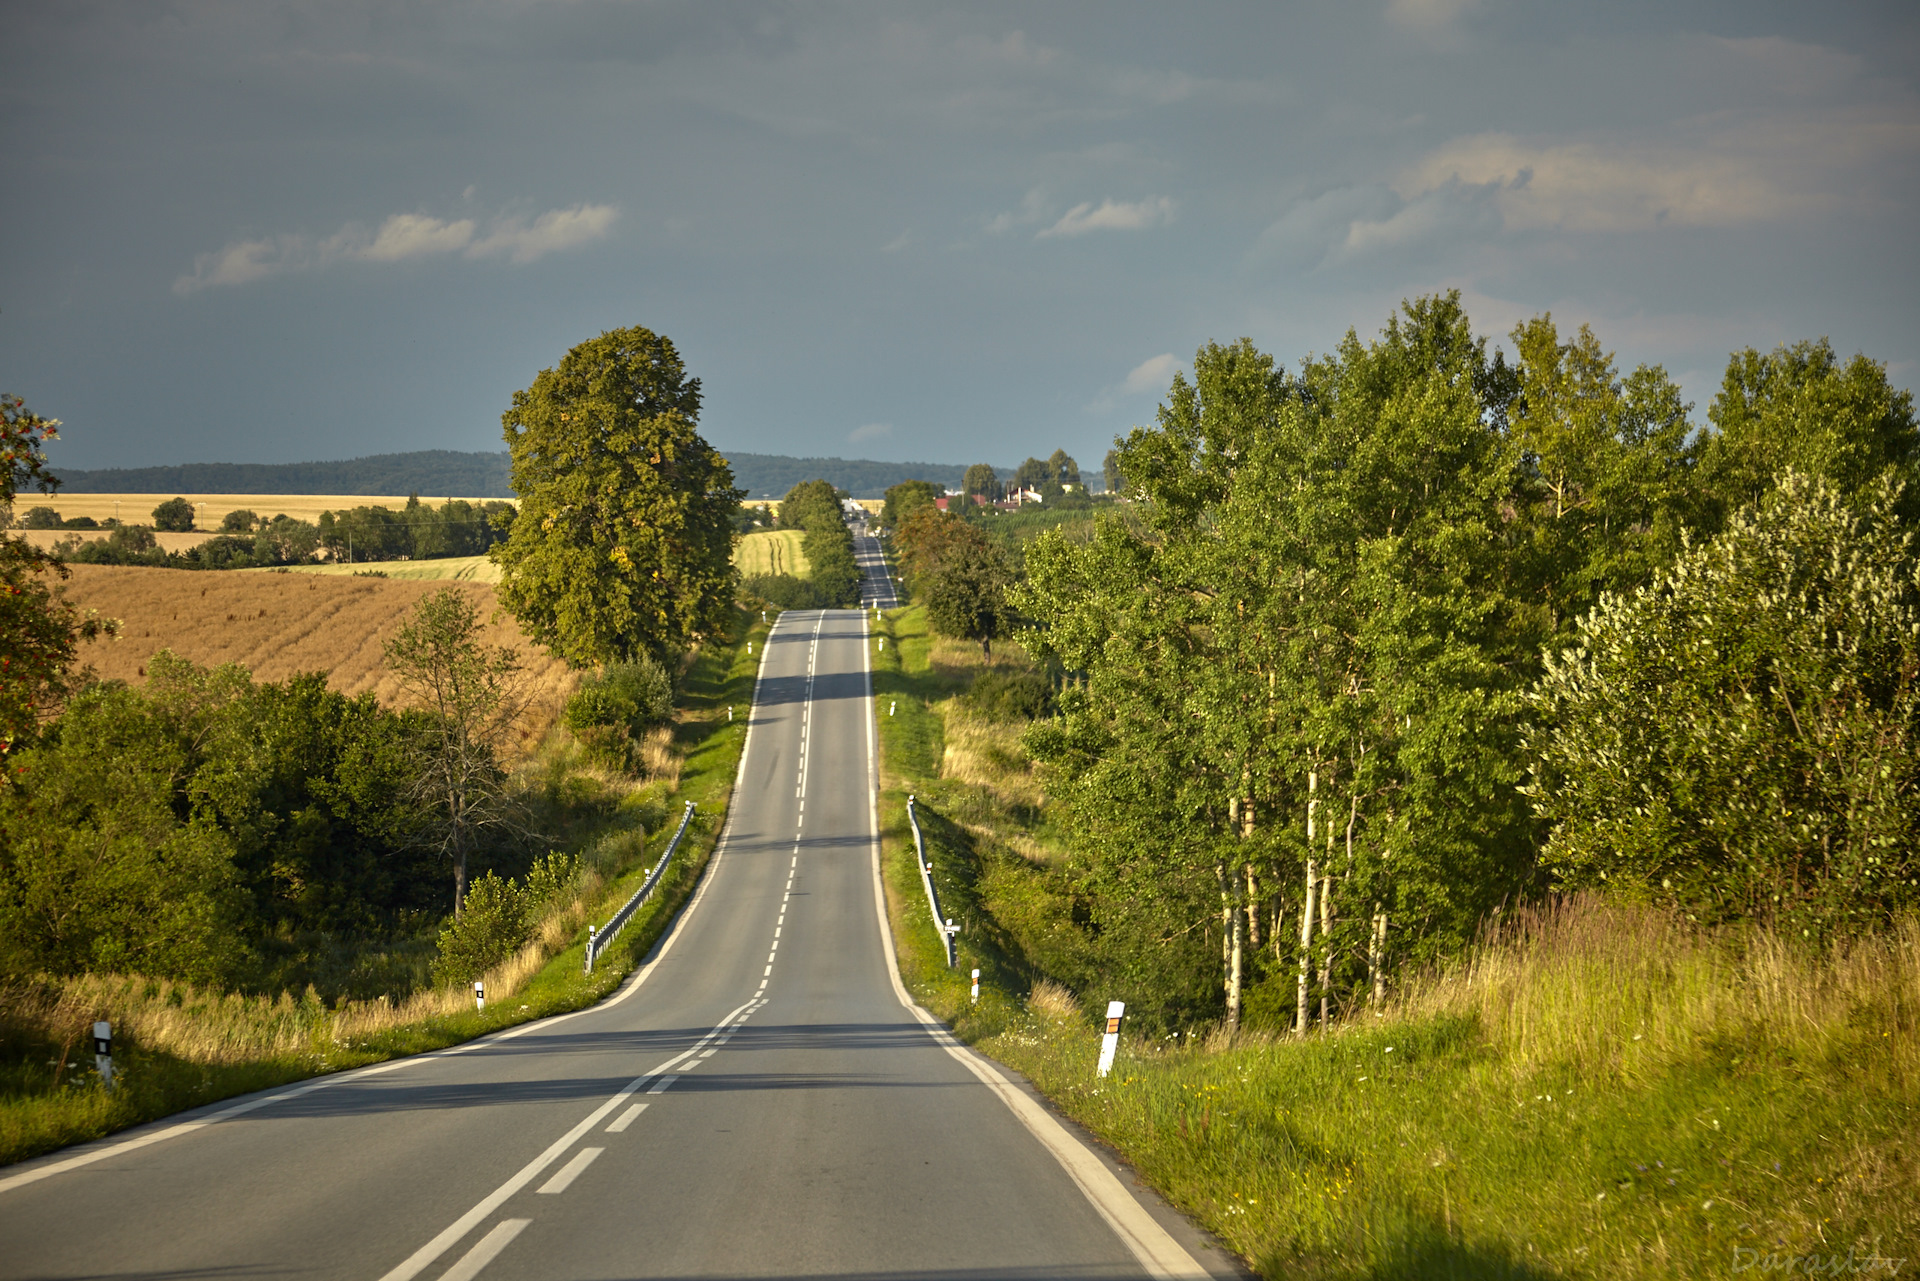 Картинки про дорогу домой